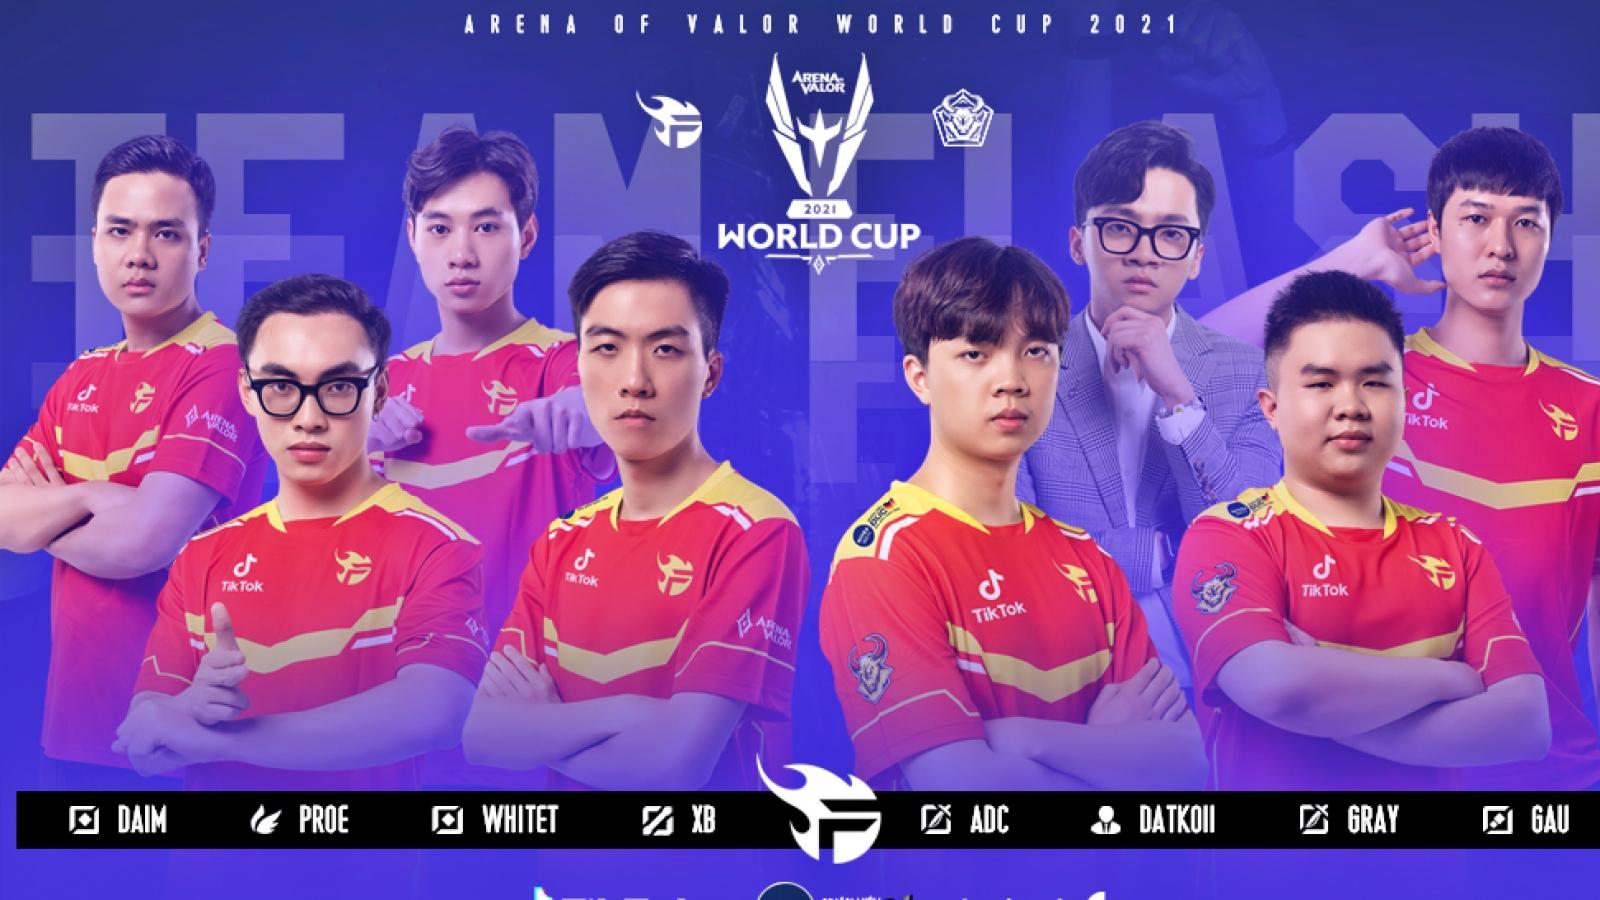 AWC 2021: Trả nợ Dewa, Team Flash của Việt Nam xếp thứ 2 bảng A tử thần